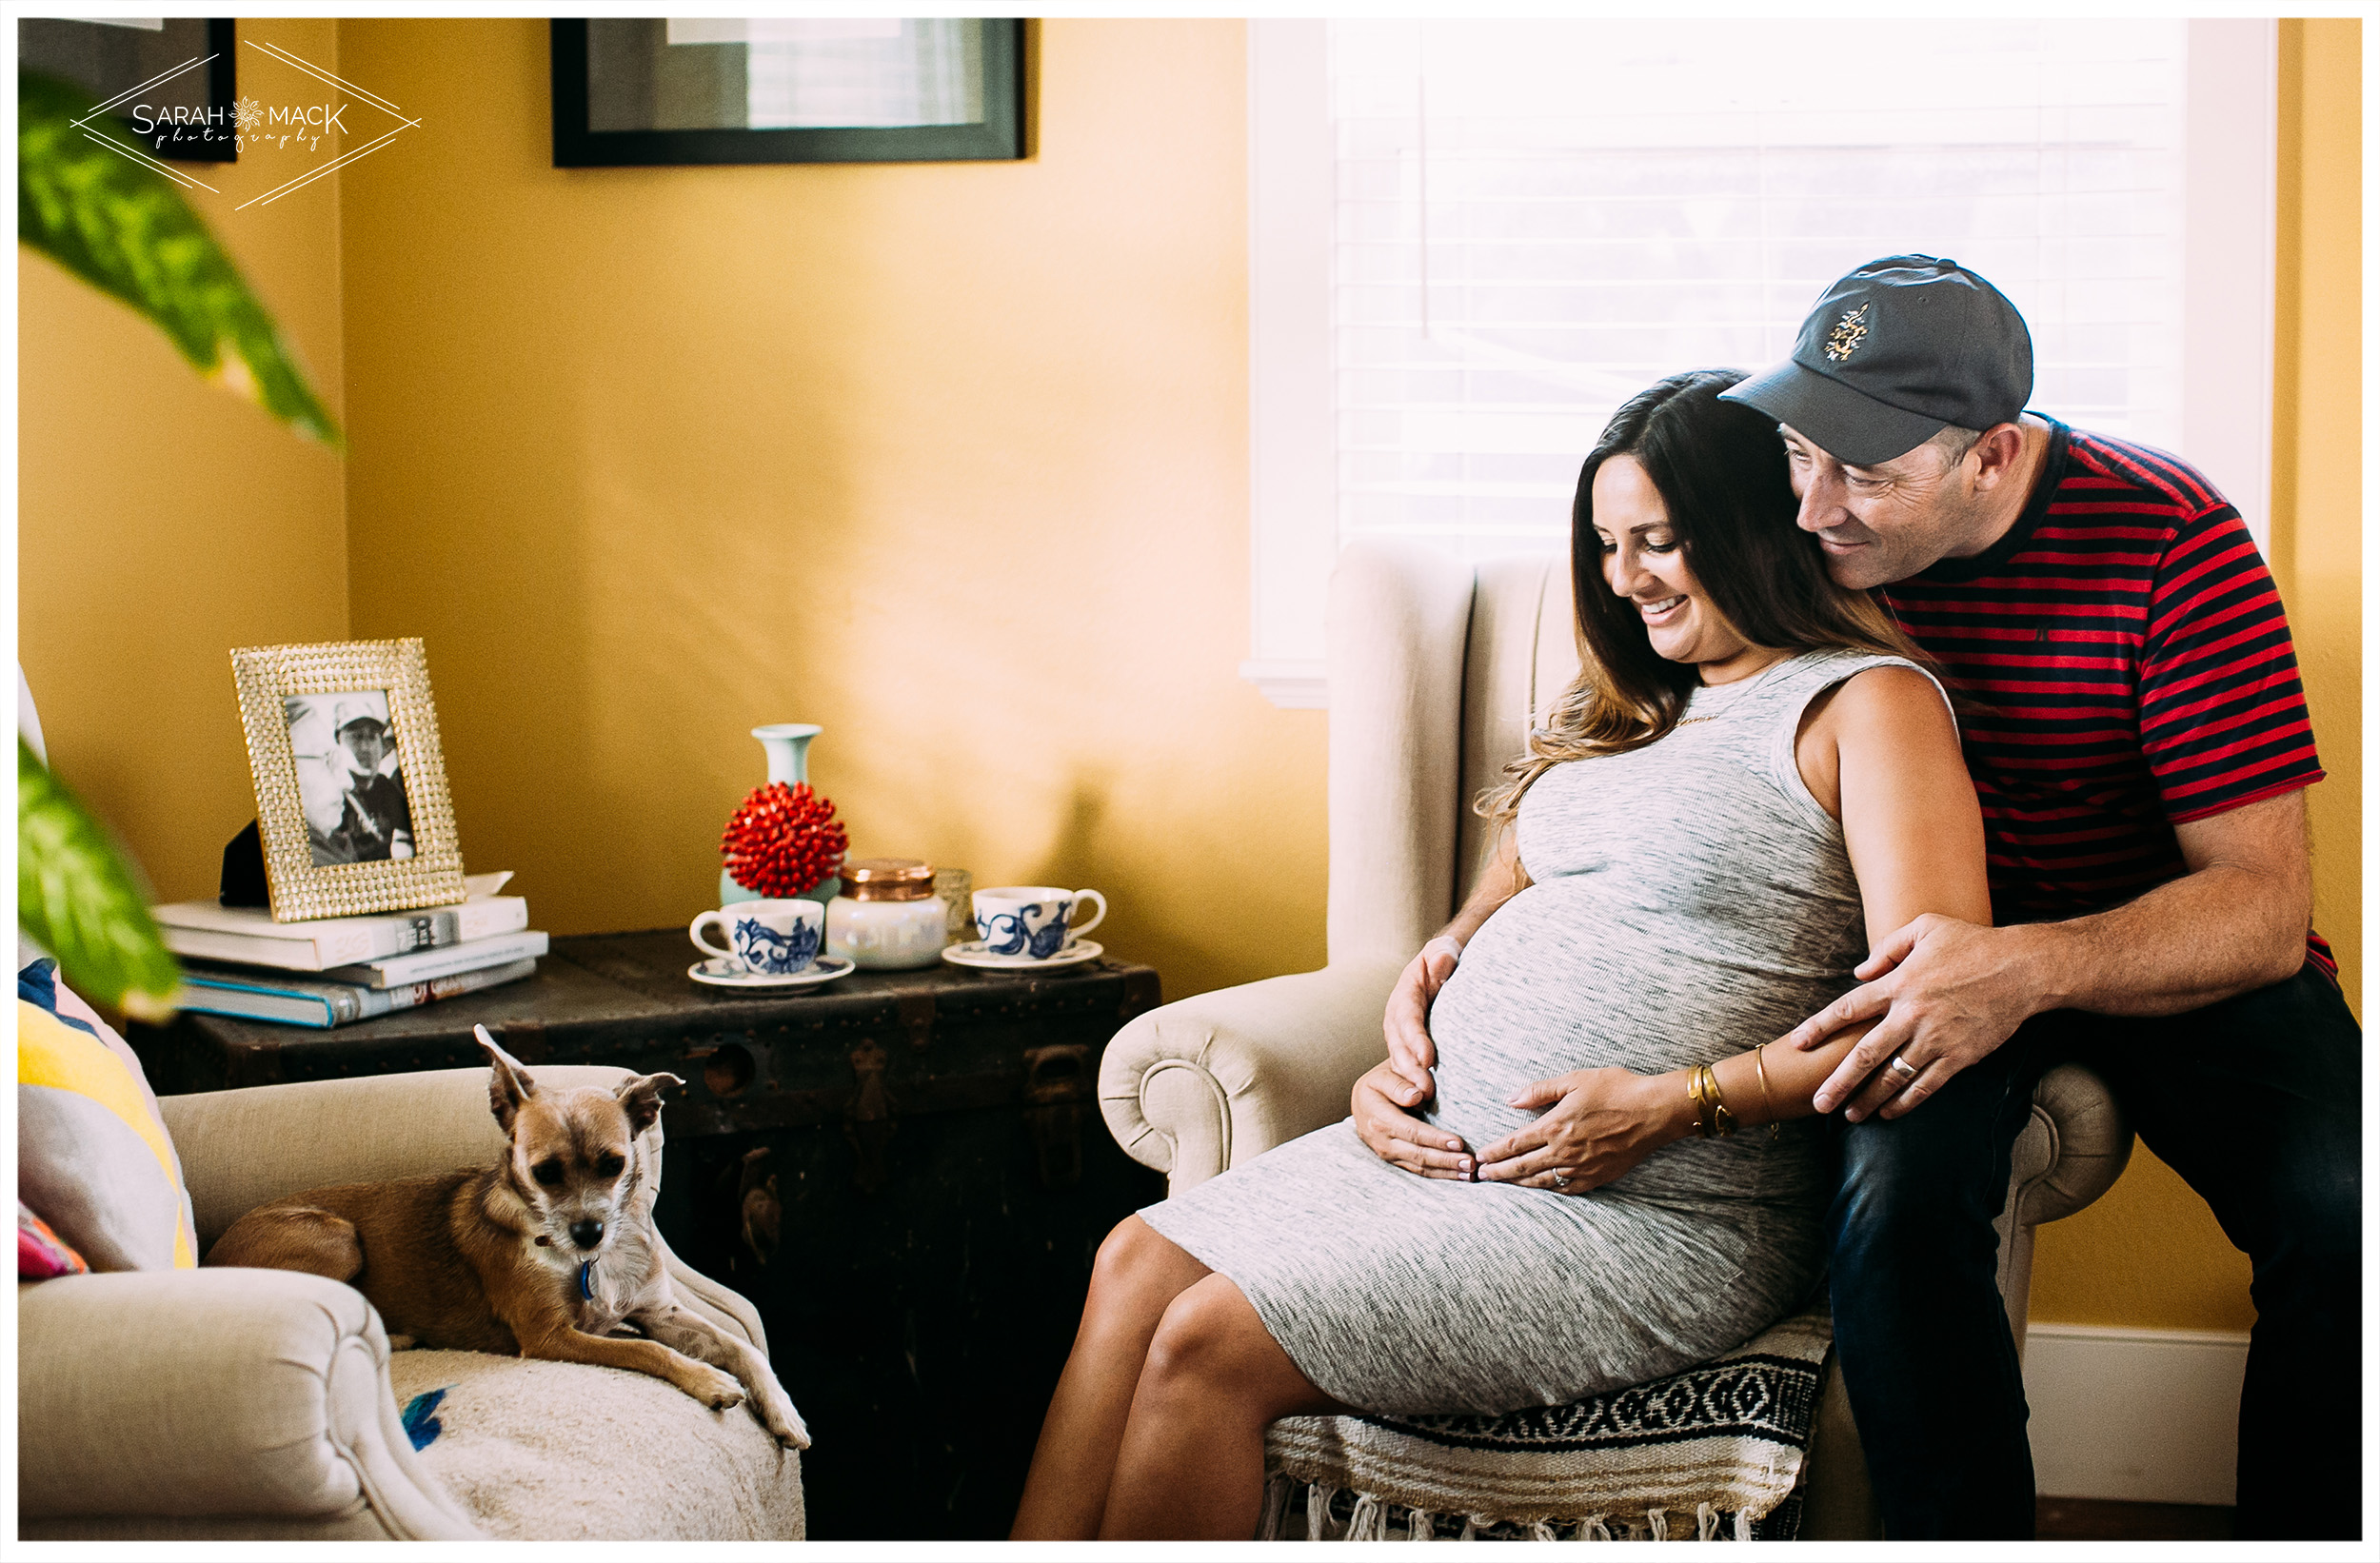 costa-mesa-home-maternity-photography-4.jpg